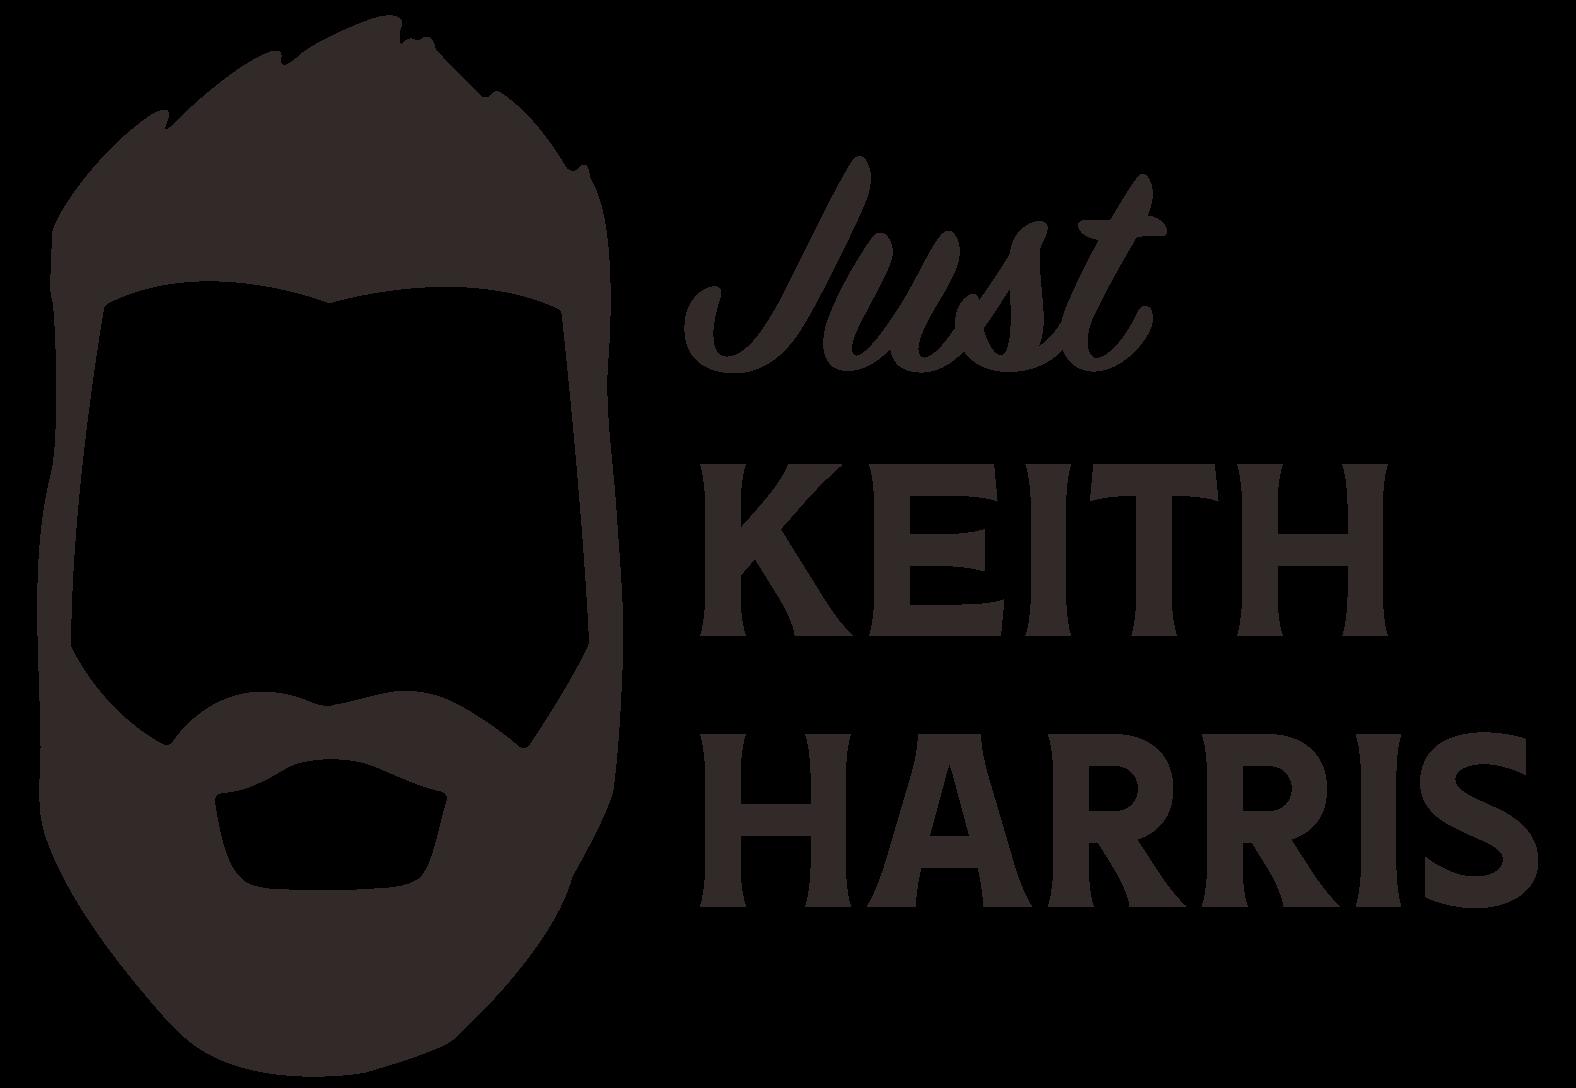 Just Keith Harris